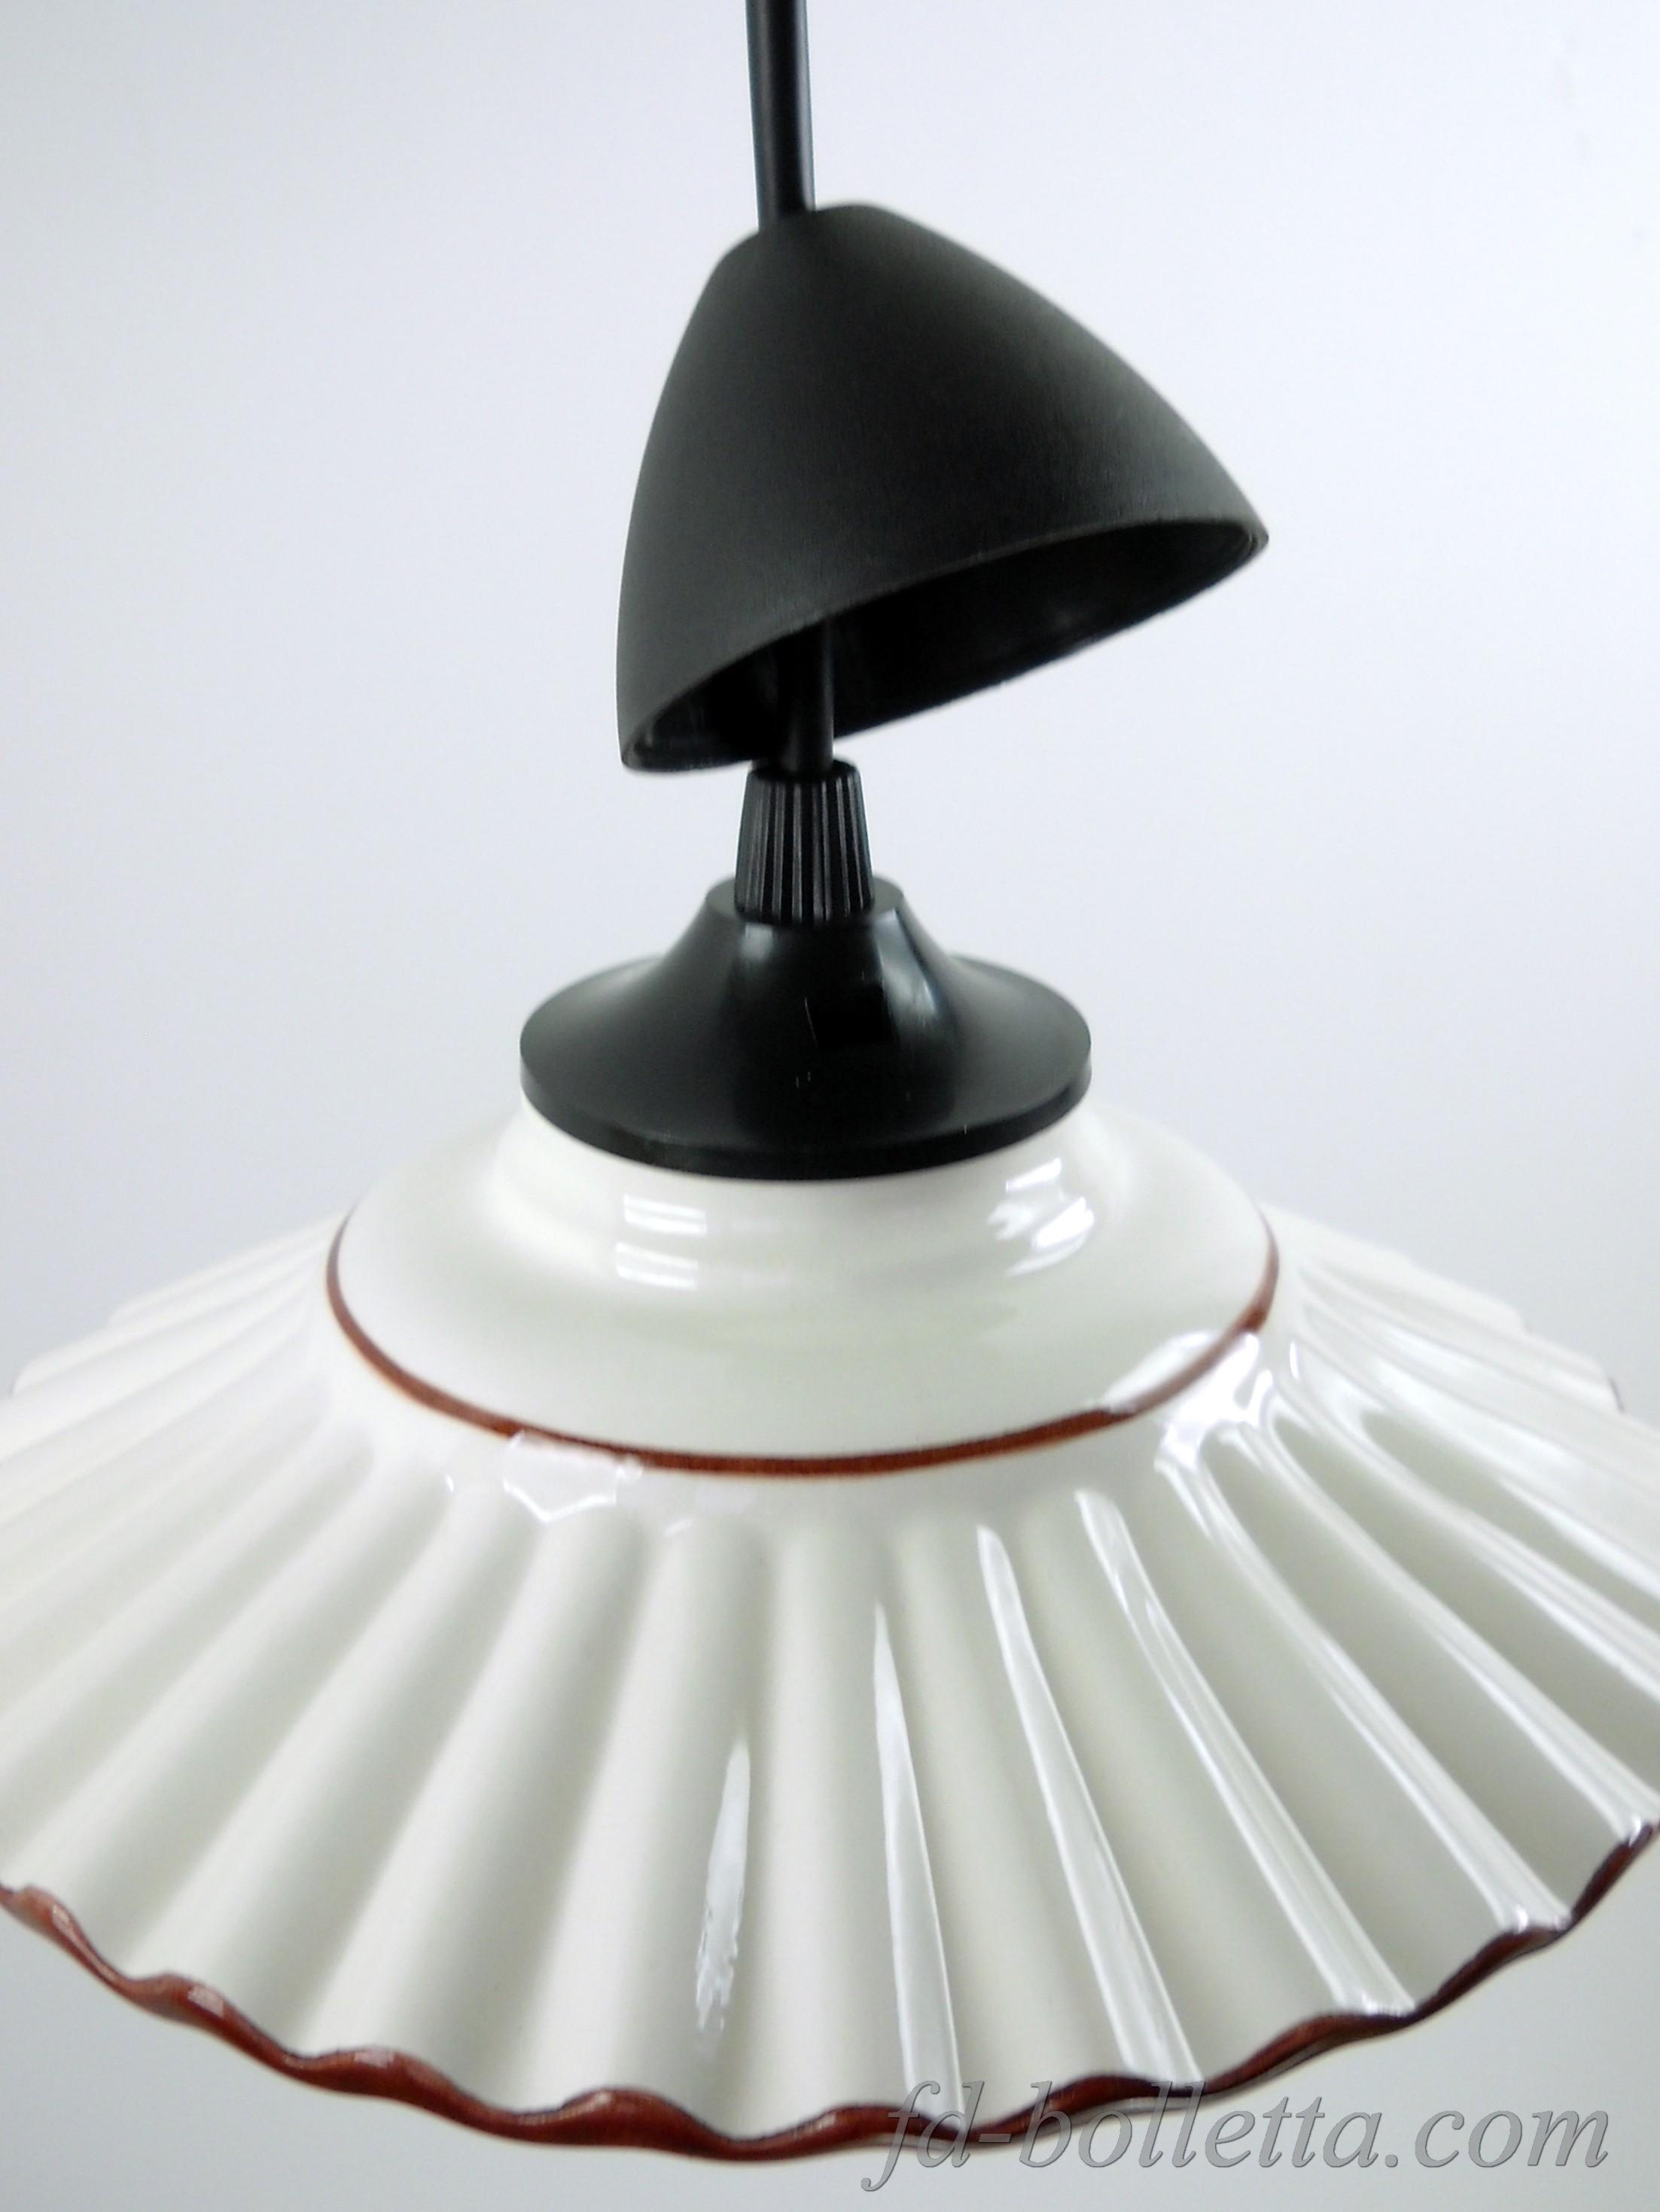 Lampadario design bianco sospensione,lampadari cavo,piatto ...